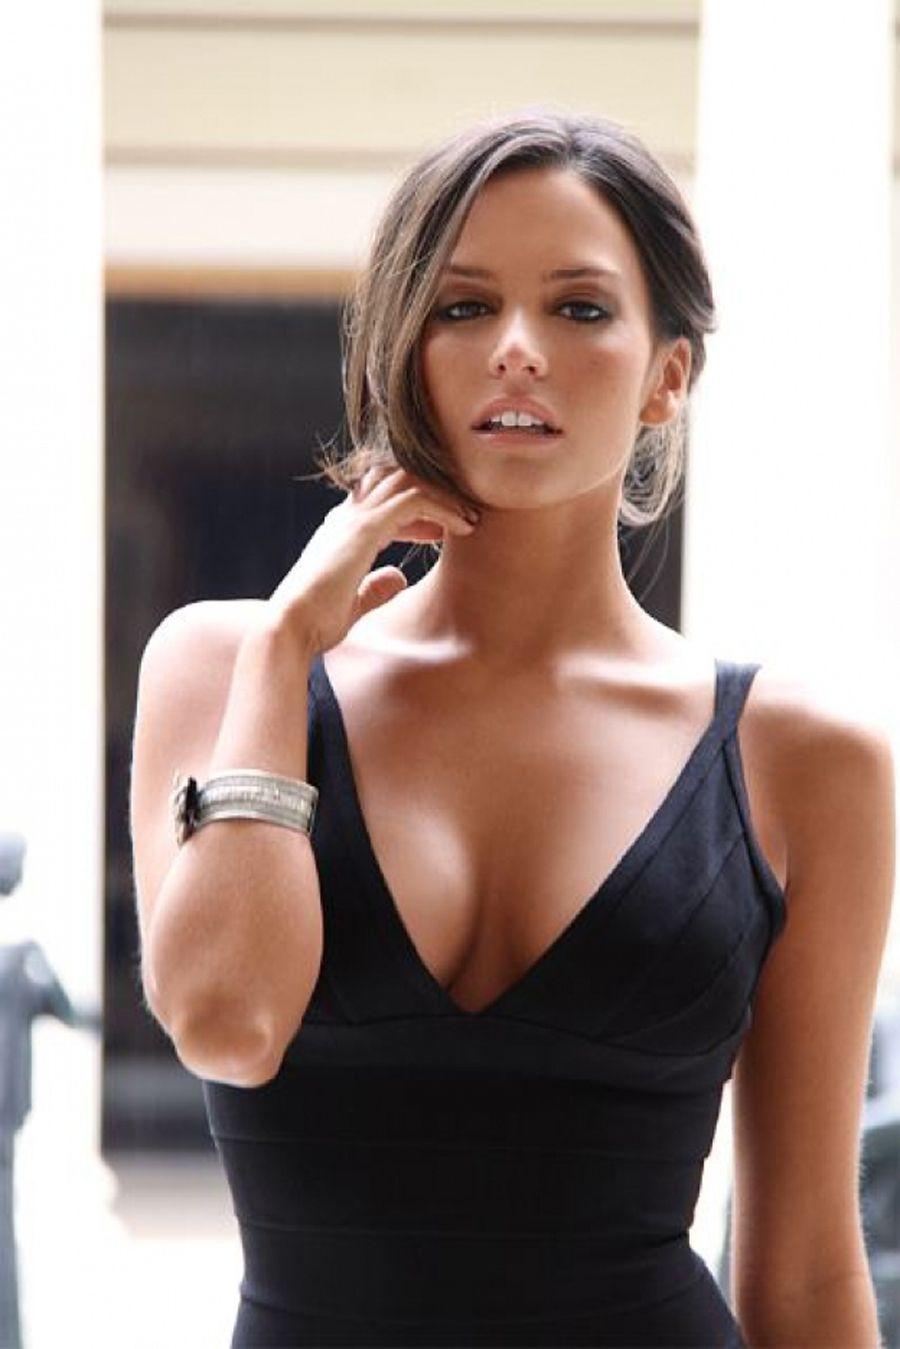 Genesis Rodriguez Nude intended for génesis rodríguez | looks | pinterest | genesis rodriguez, girls